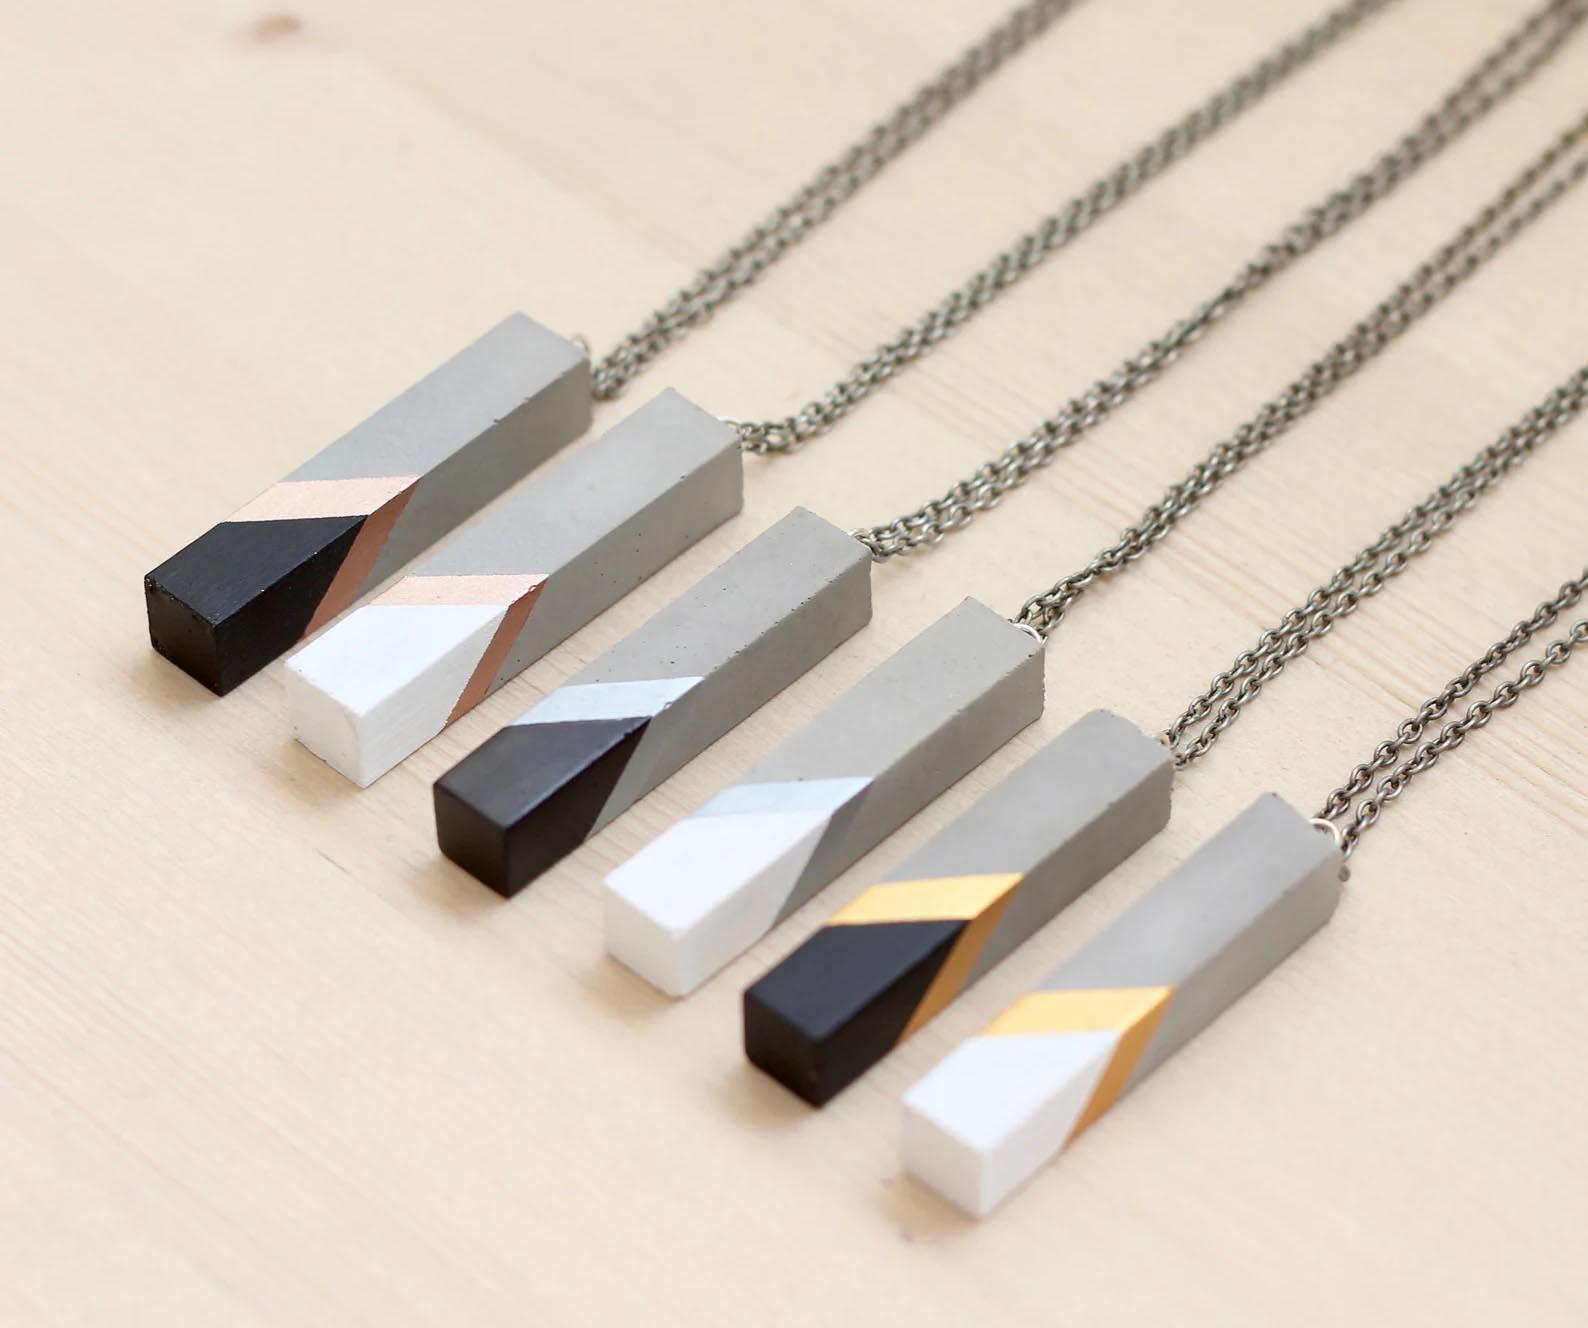 Modern Gift Ideas - Concrete bar necklace.